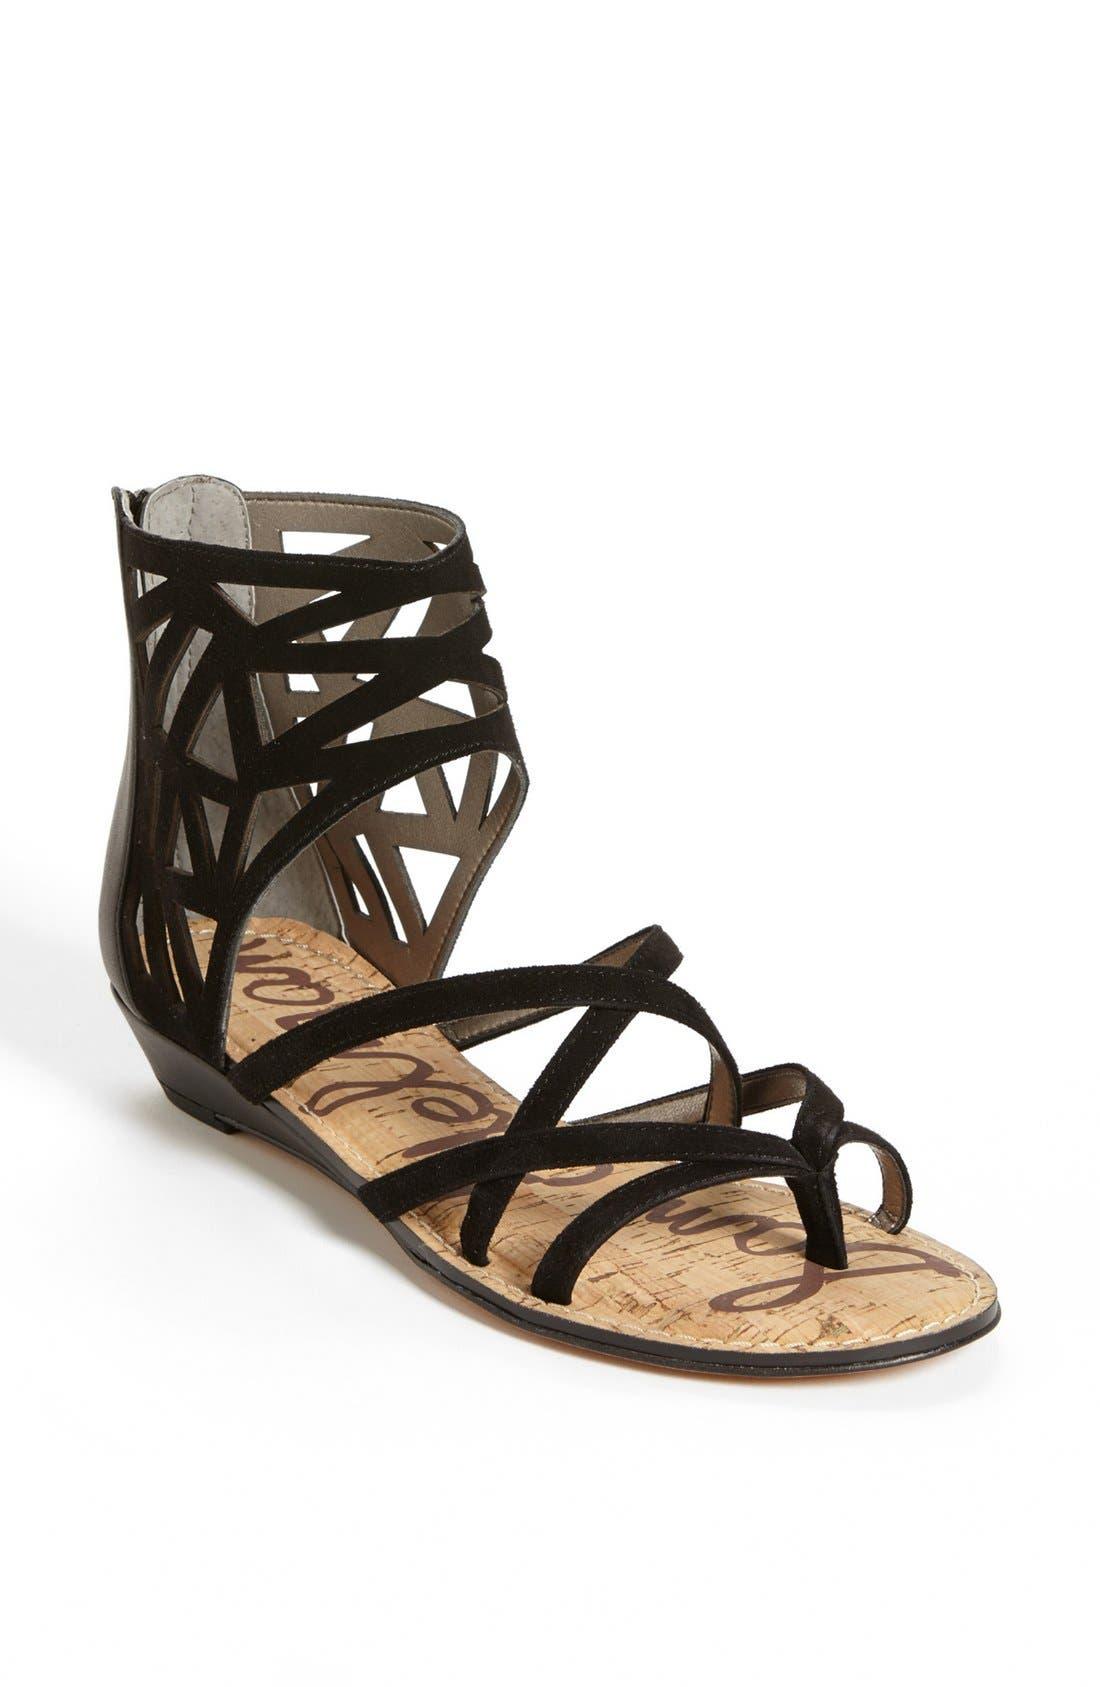 Alternate Image 1 Selected - Sam Edelman 'Dana' Leather Sandal